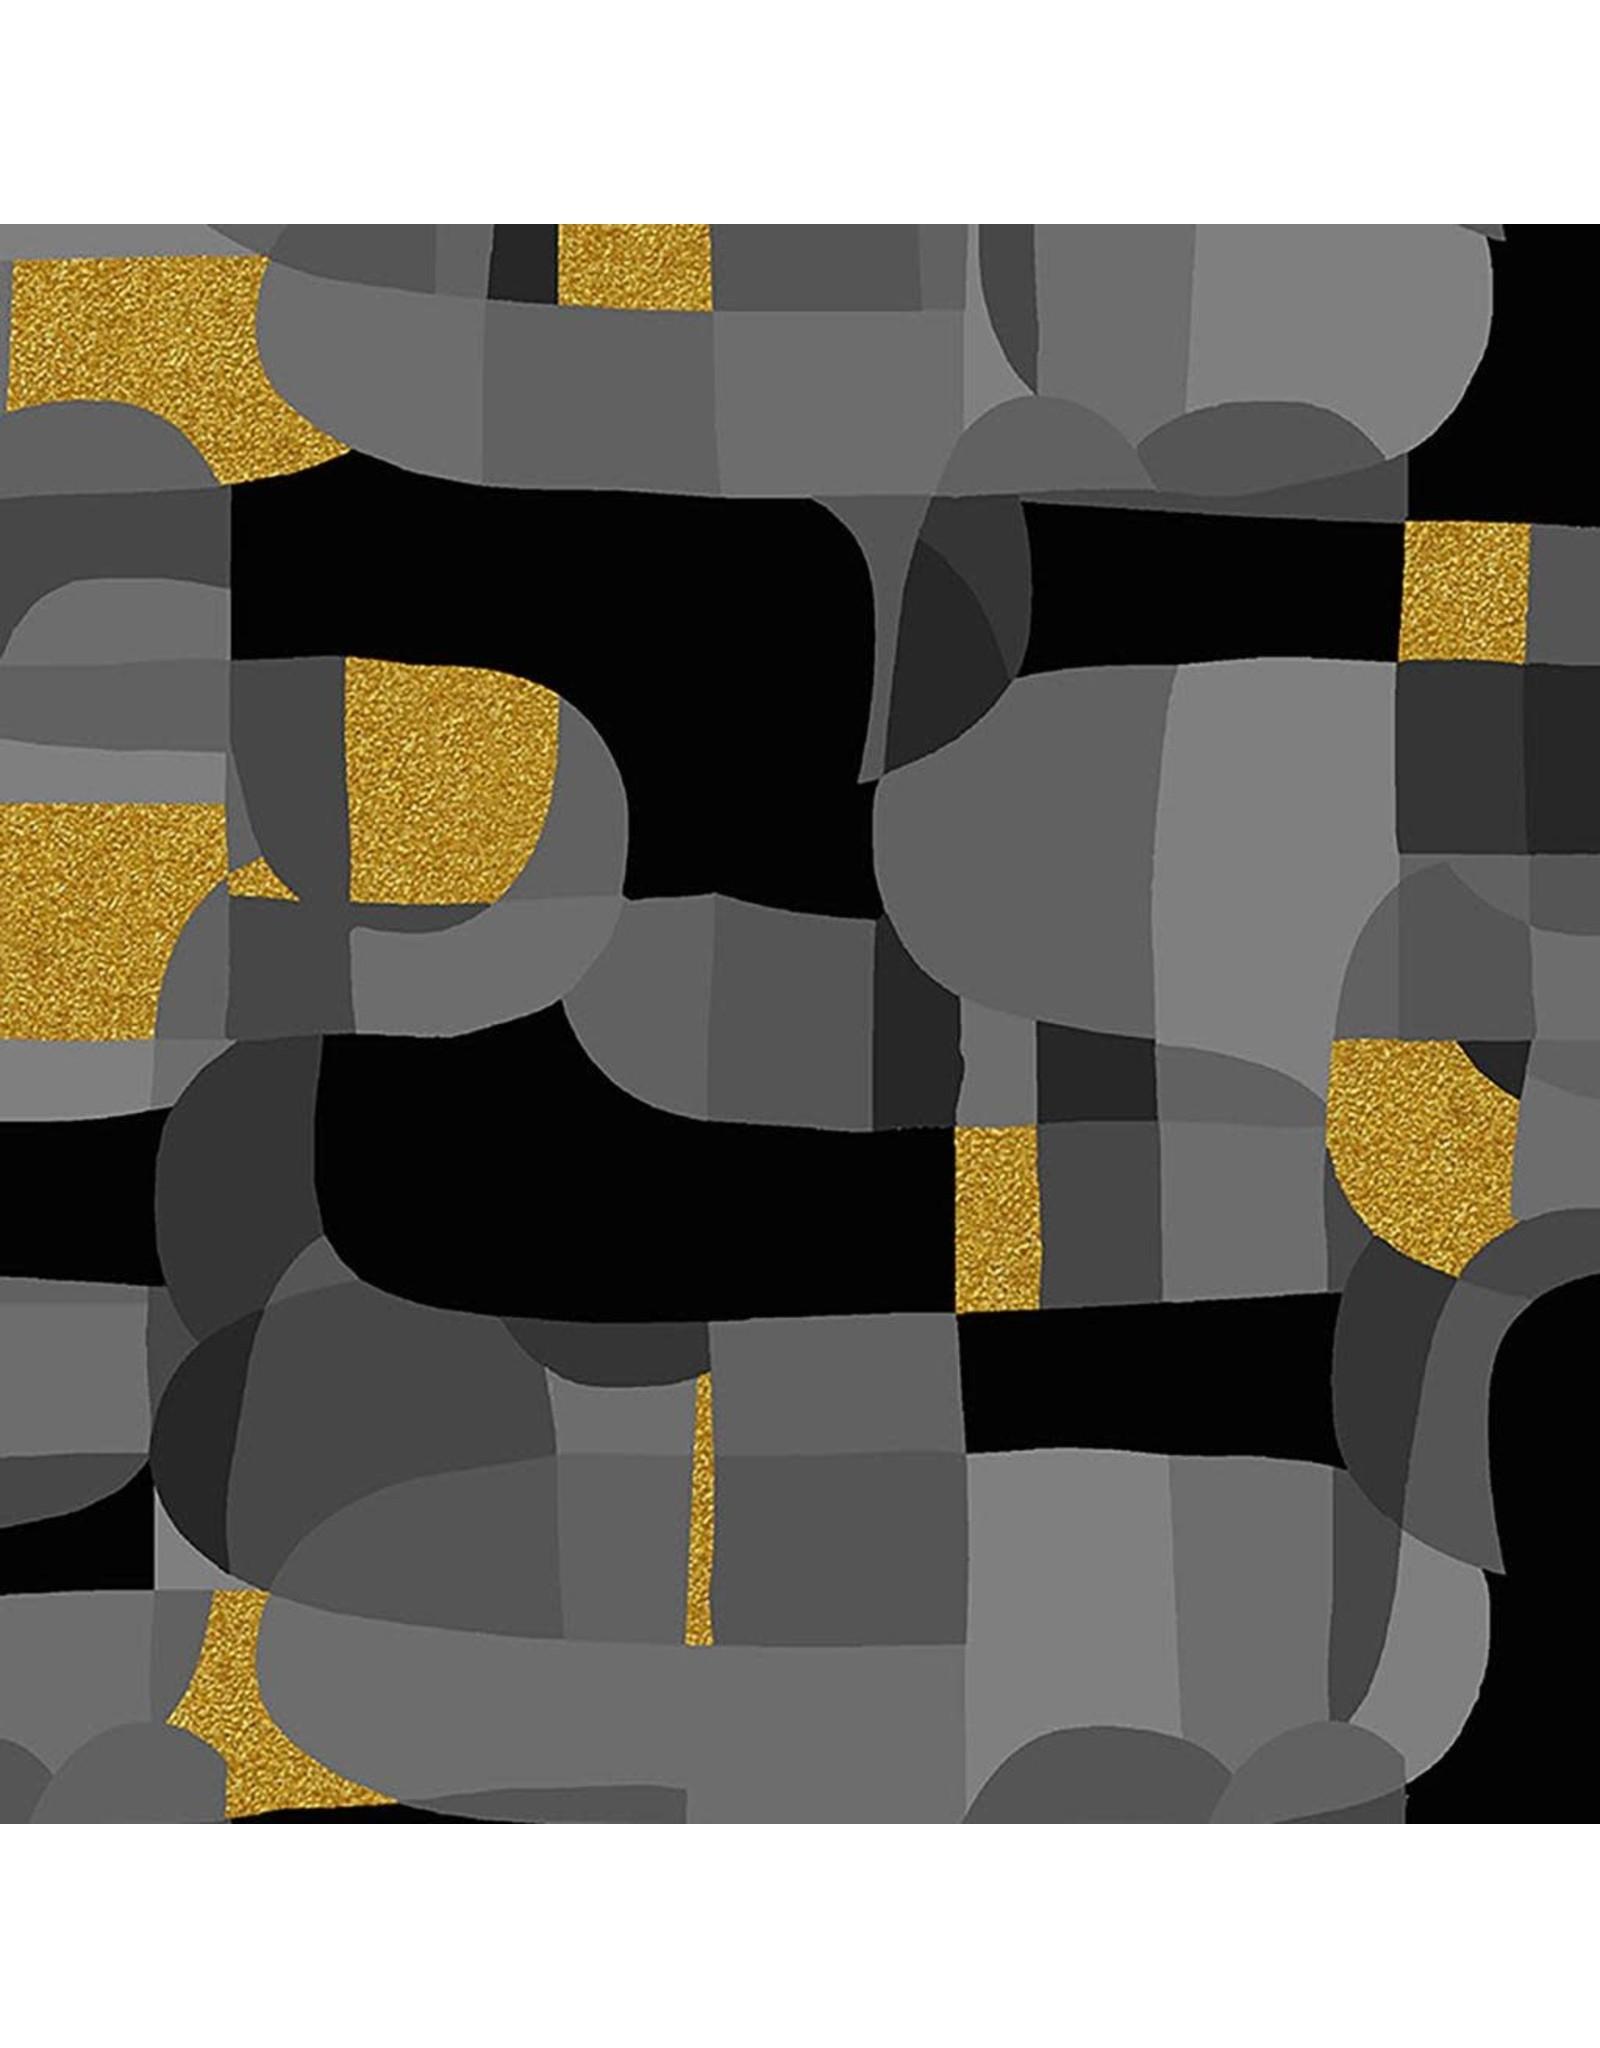 RJR Fabrics Shiny Objects, Glitz and Glamour Abstrct in Black with Gold Metallic, Fabric Half-Yards RJ2800-BK1M